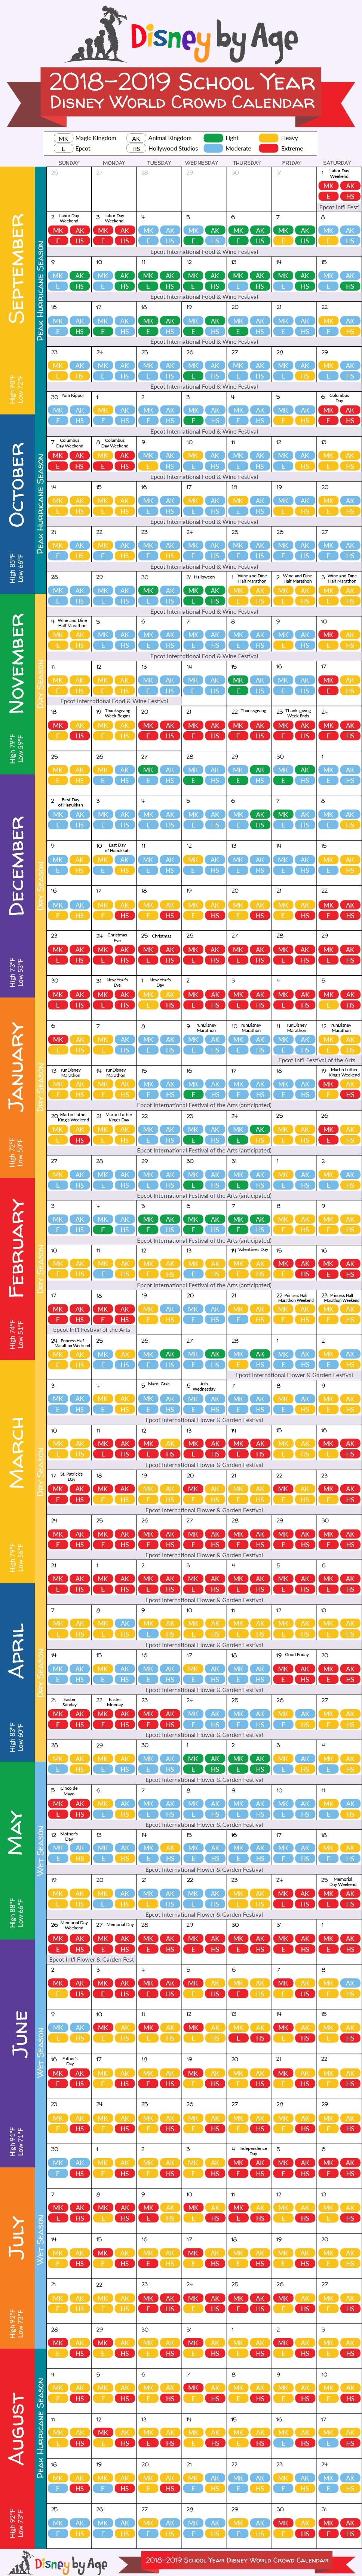 Disney World Crowd Calendar 2018 And 2019-Disney Crowd Calendar January 2020